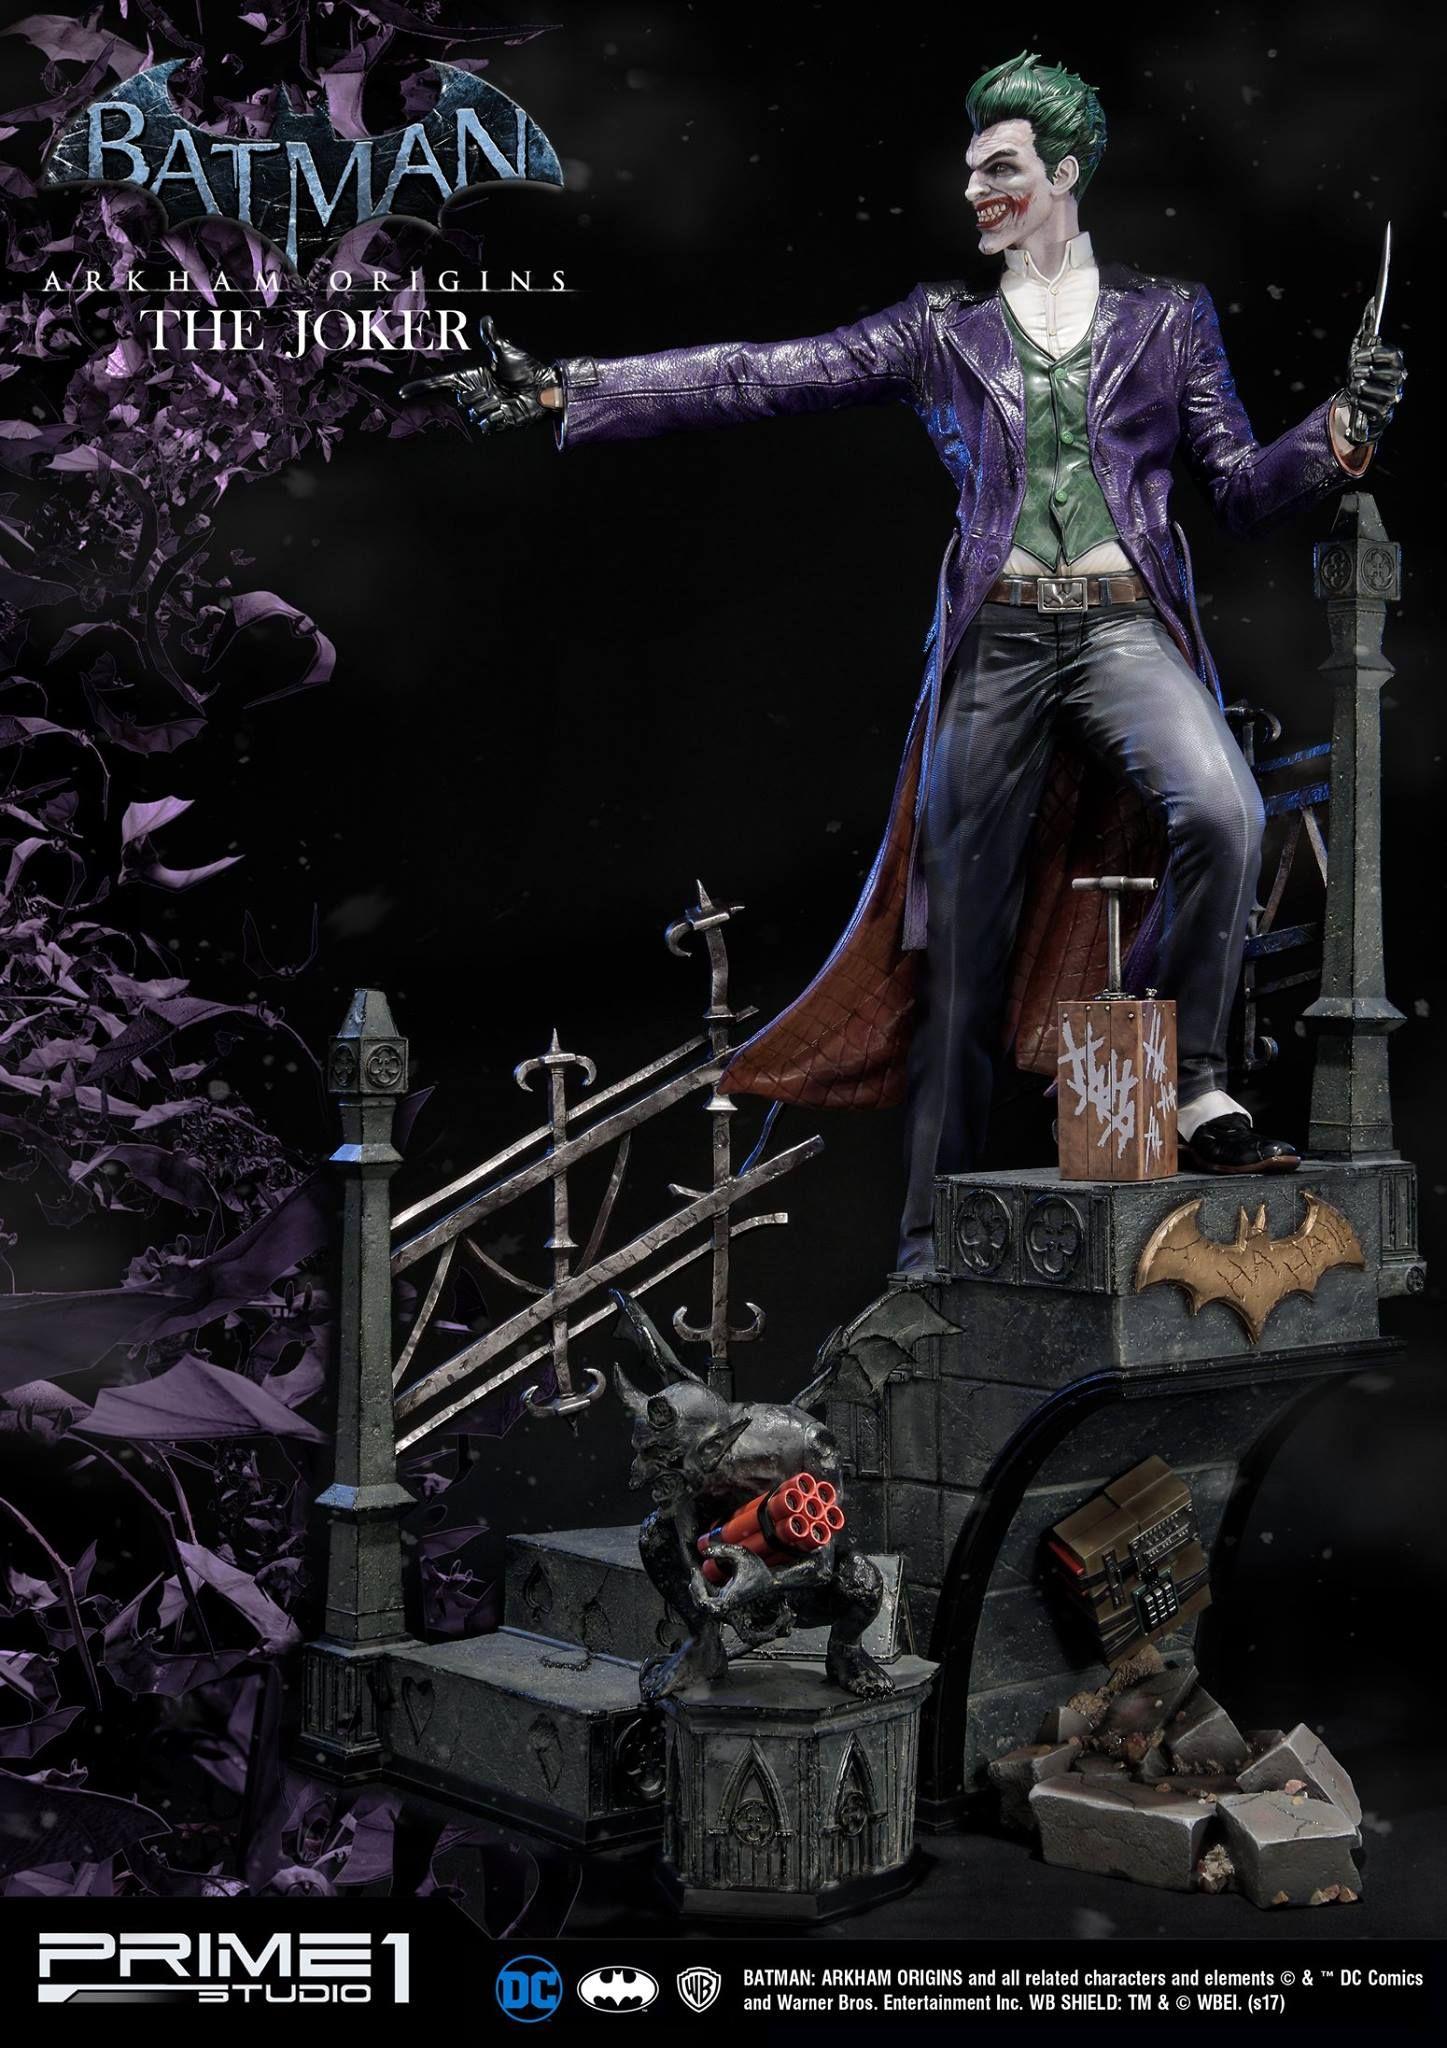 Prime 1 arkham origins joker statue 011g 14472048 batman prime 1 arkham origins joker statue 011g voltagebd Images